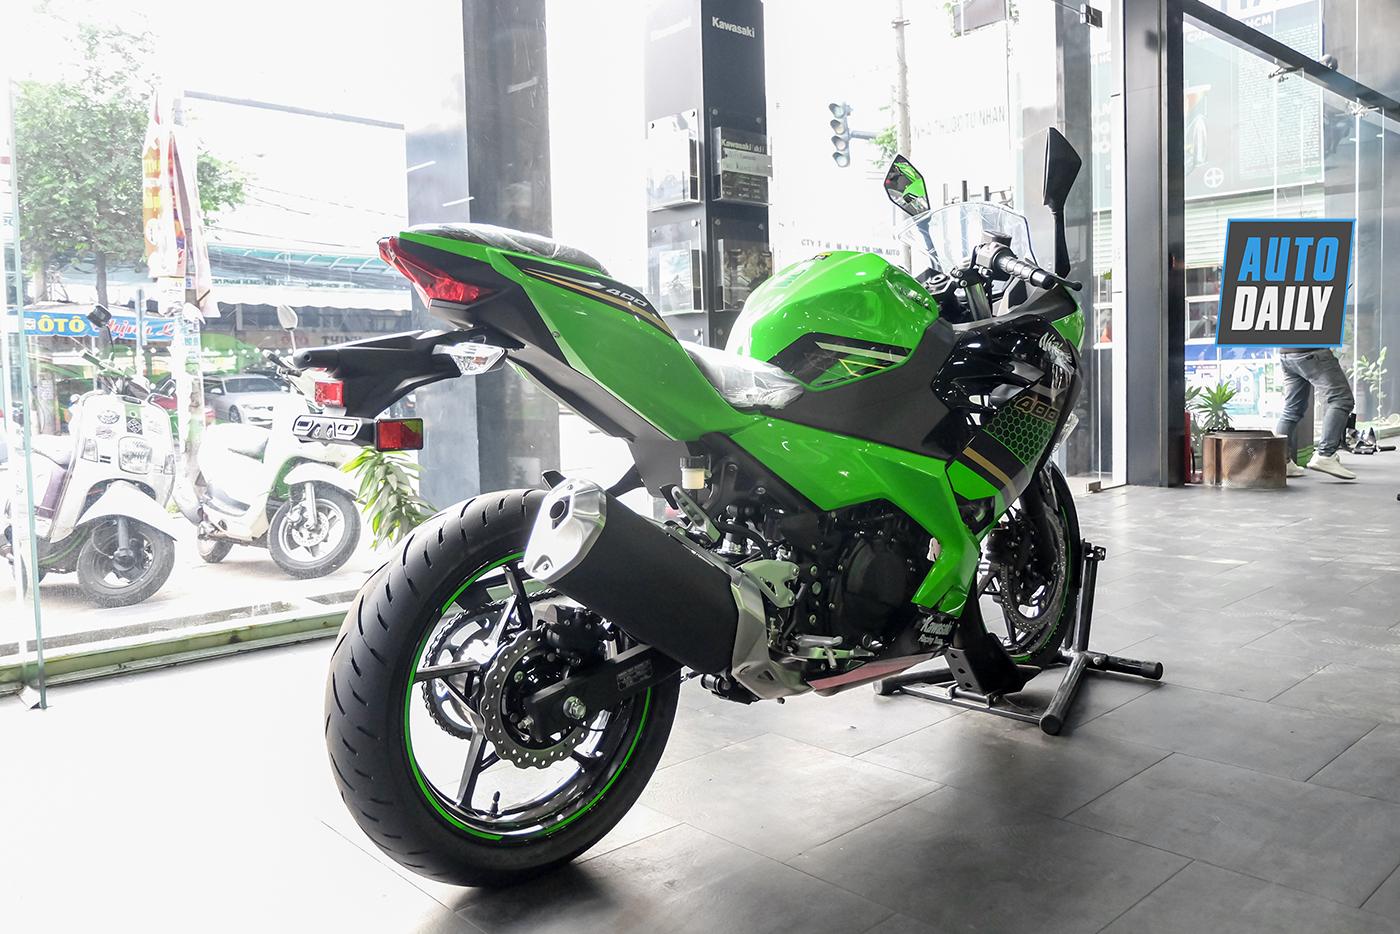 kawasaki-ninja-400-abs-krt-2020-5.jpg